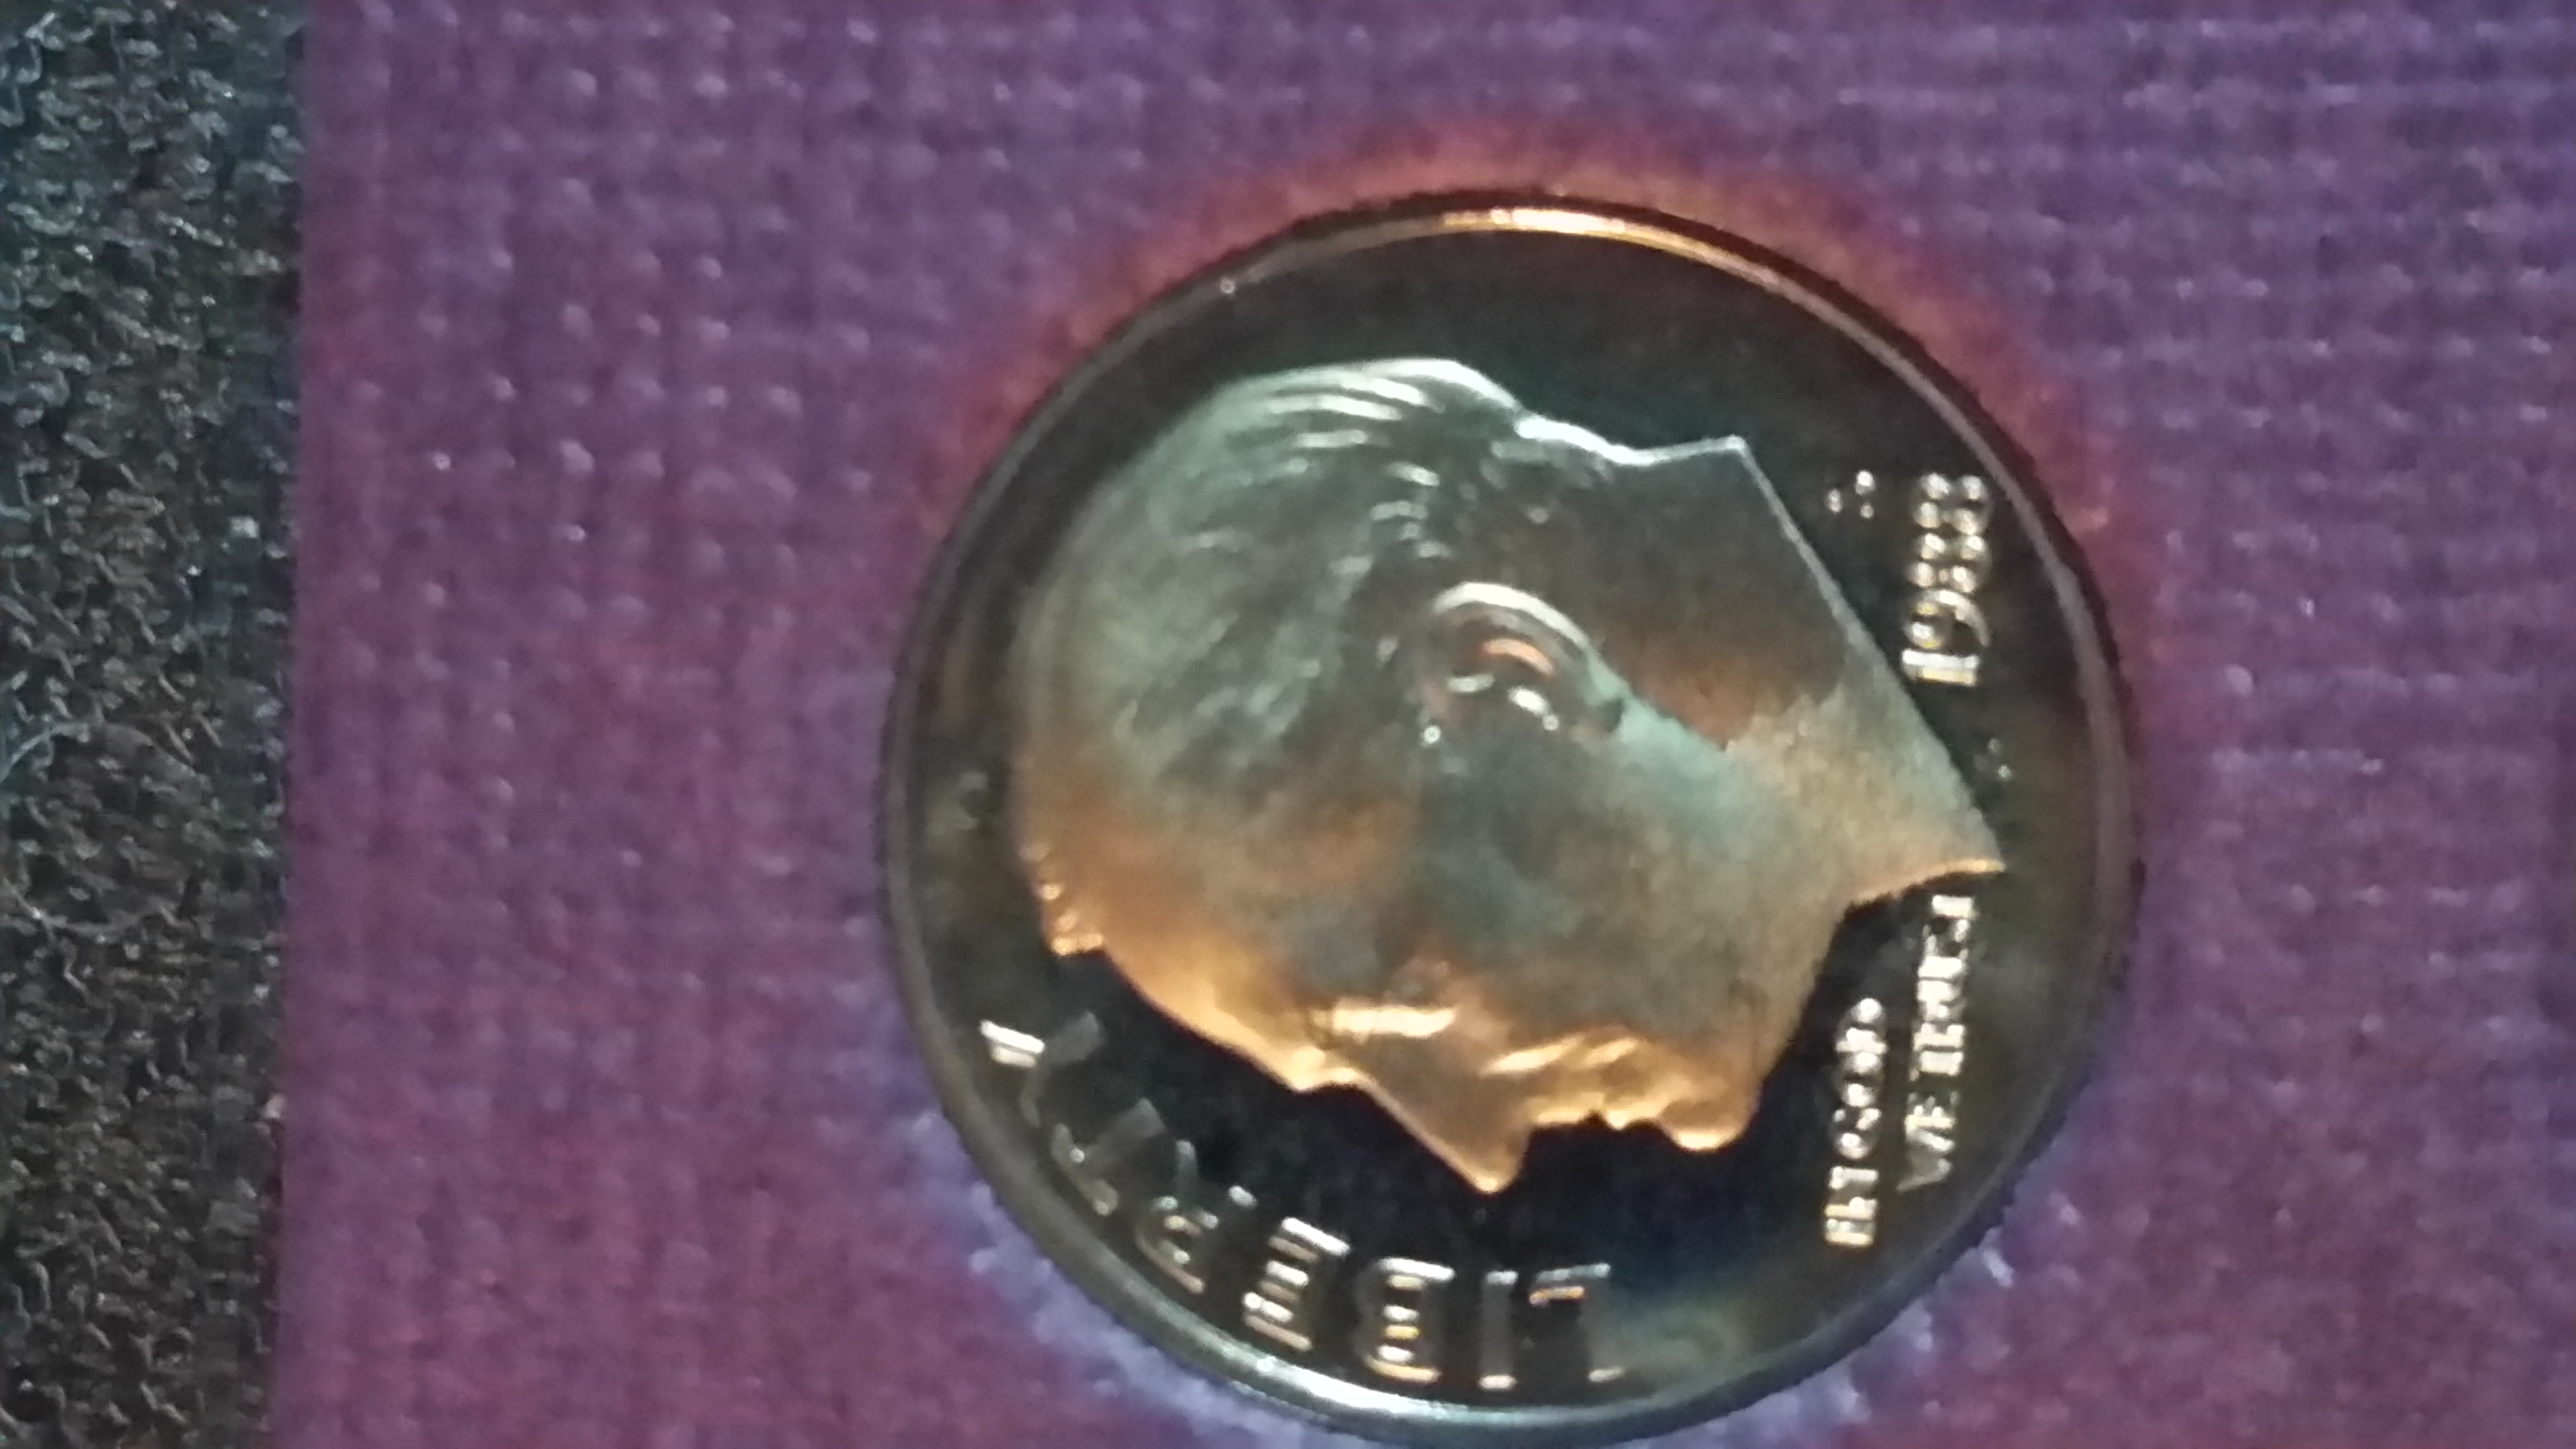 Value 1935 Penny Abebeeafdfdcabbaedaacedcebcadbe